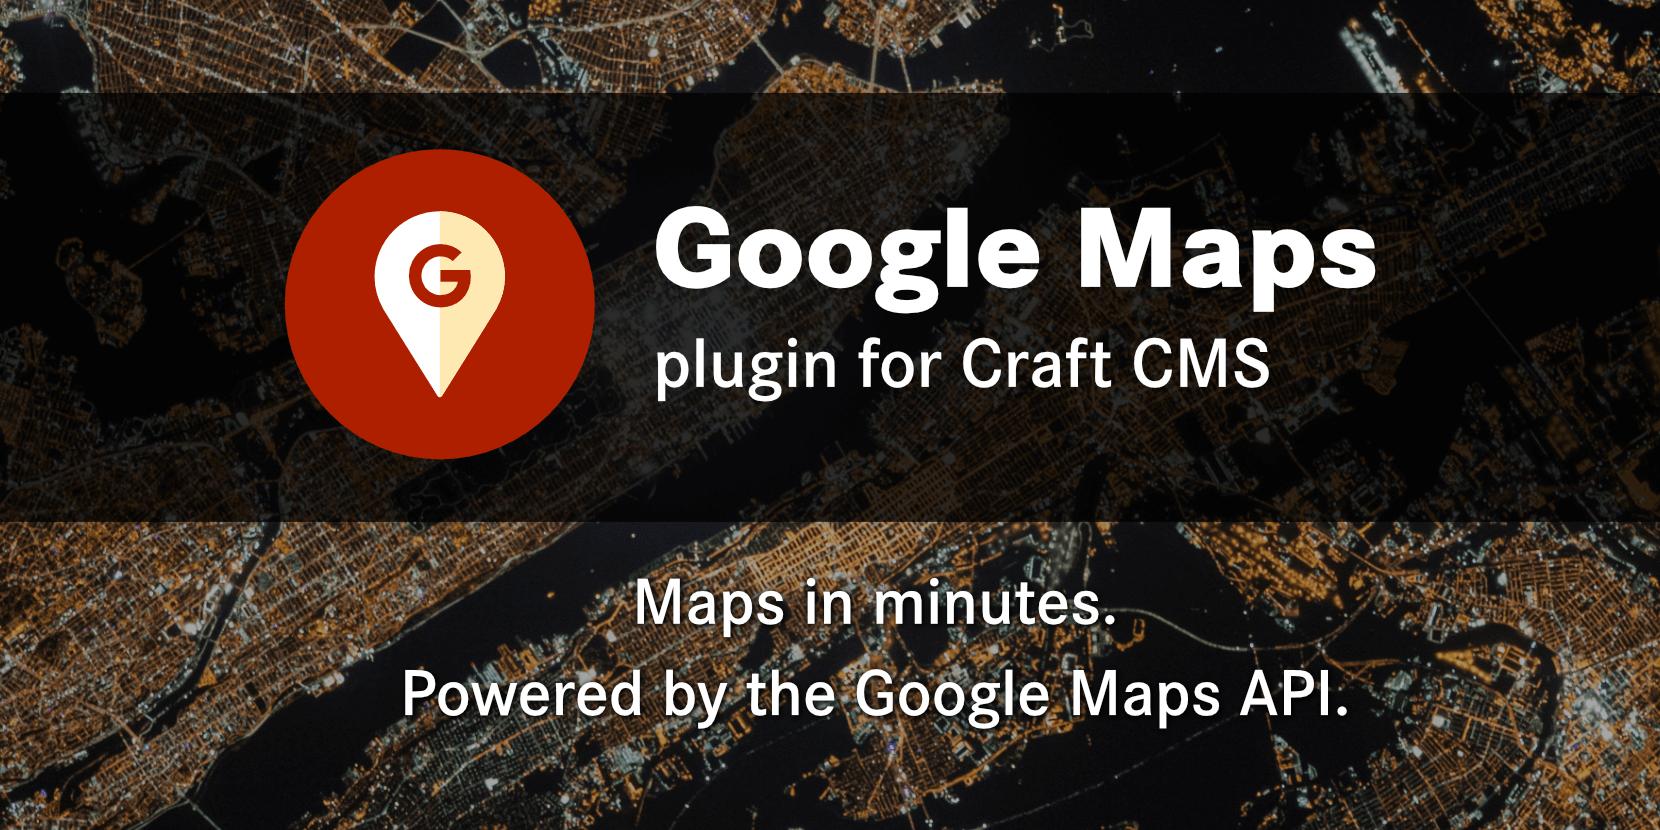 Smart Map is dead. Long live Google Maps! image